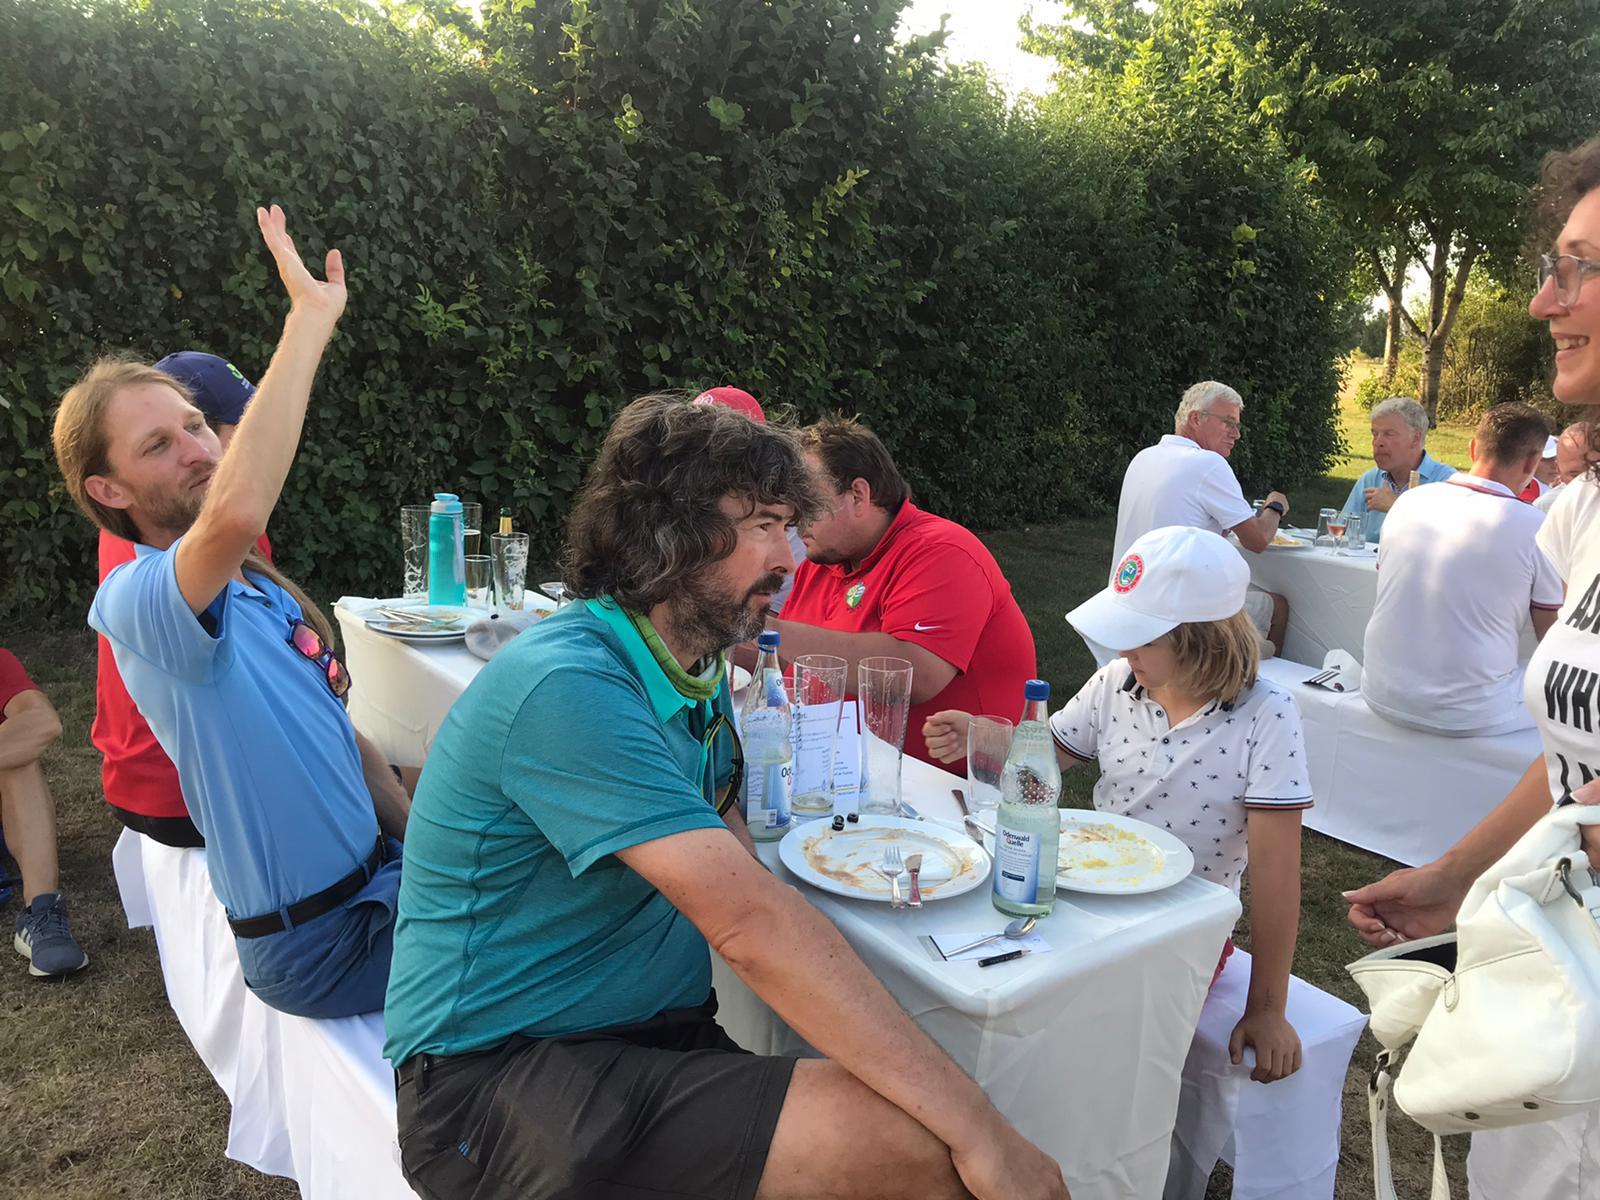 69_Golfturnier_Soroptimist_Golf_en_blanc